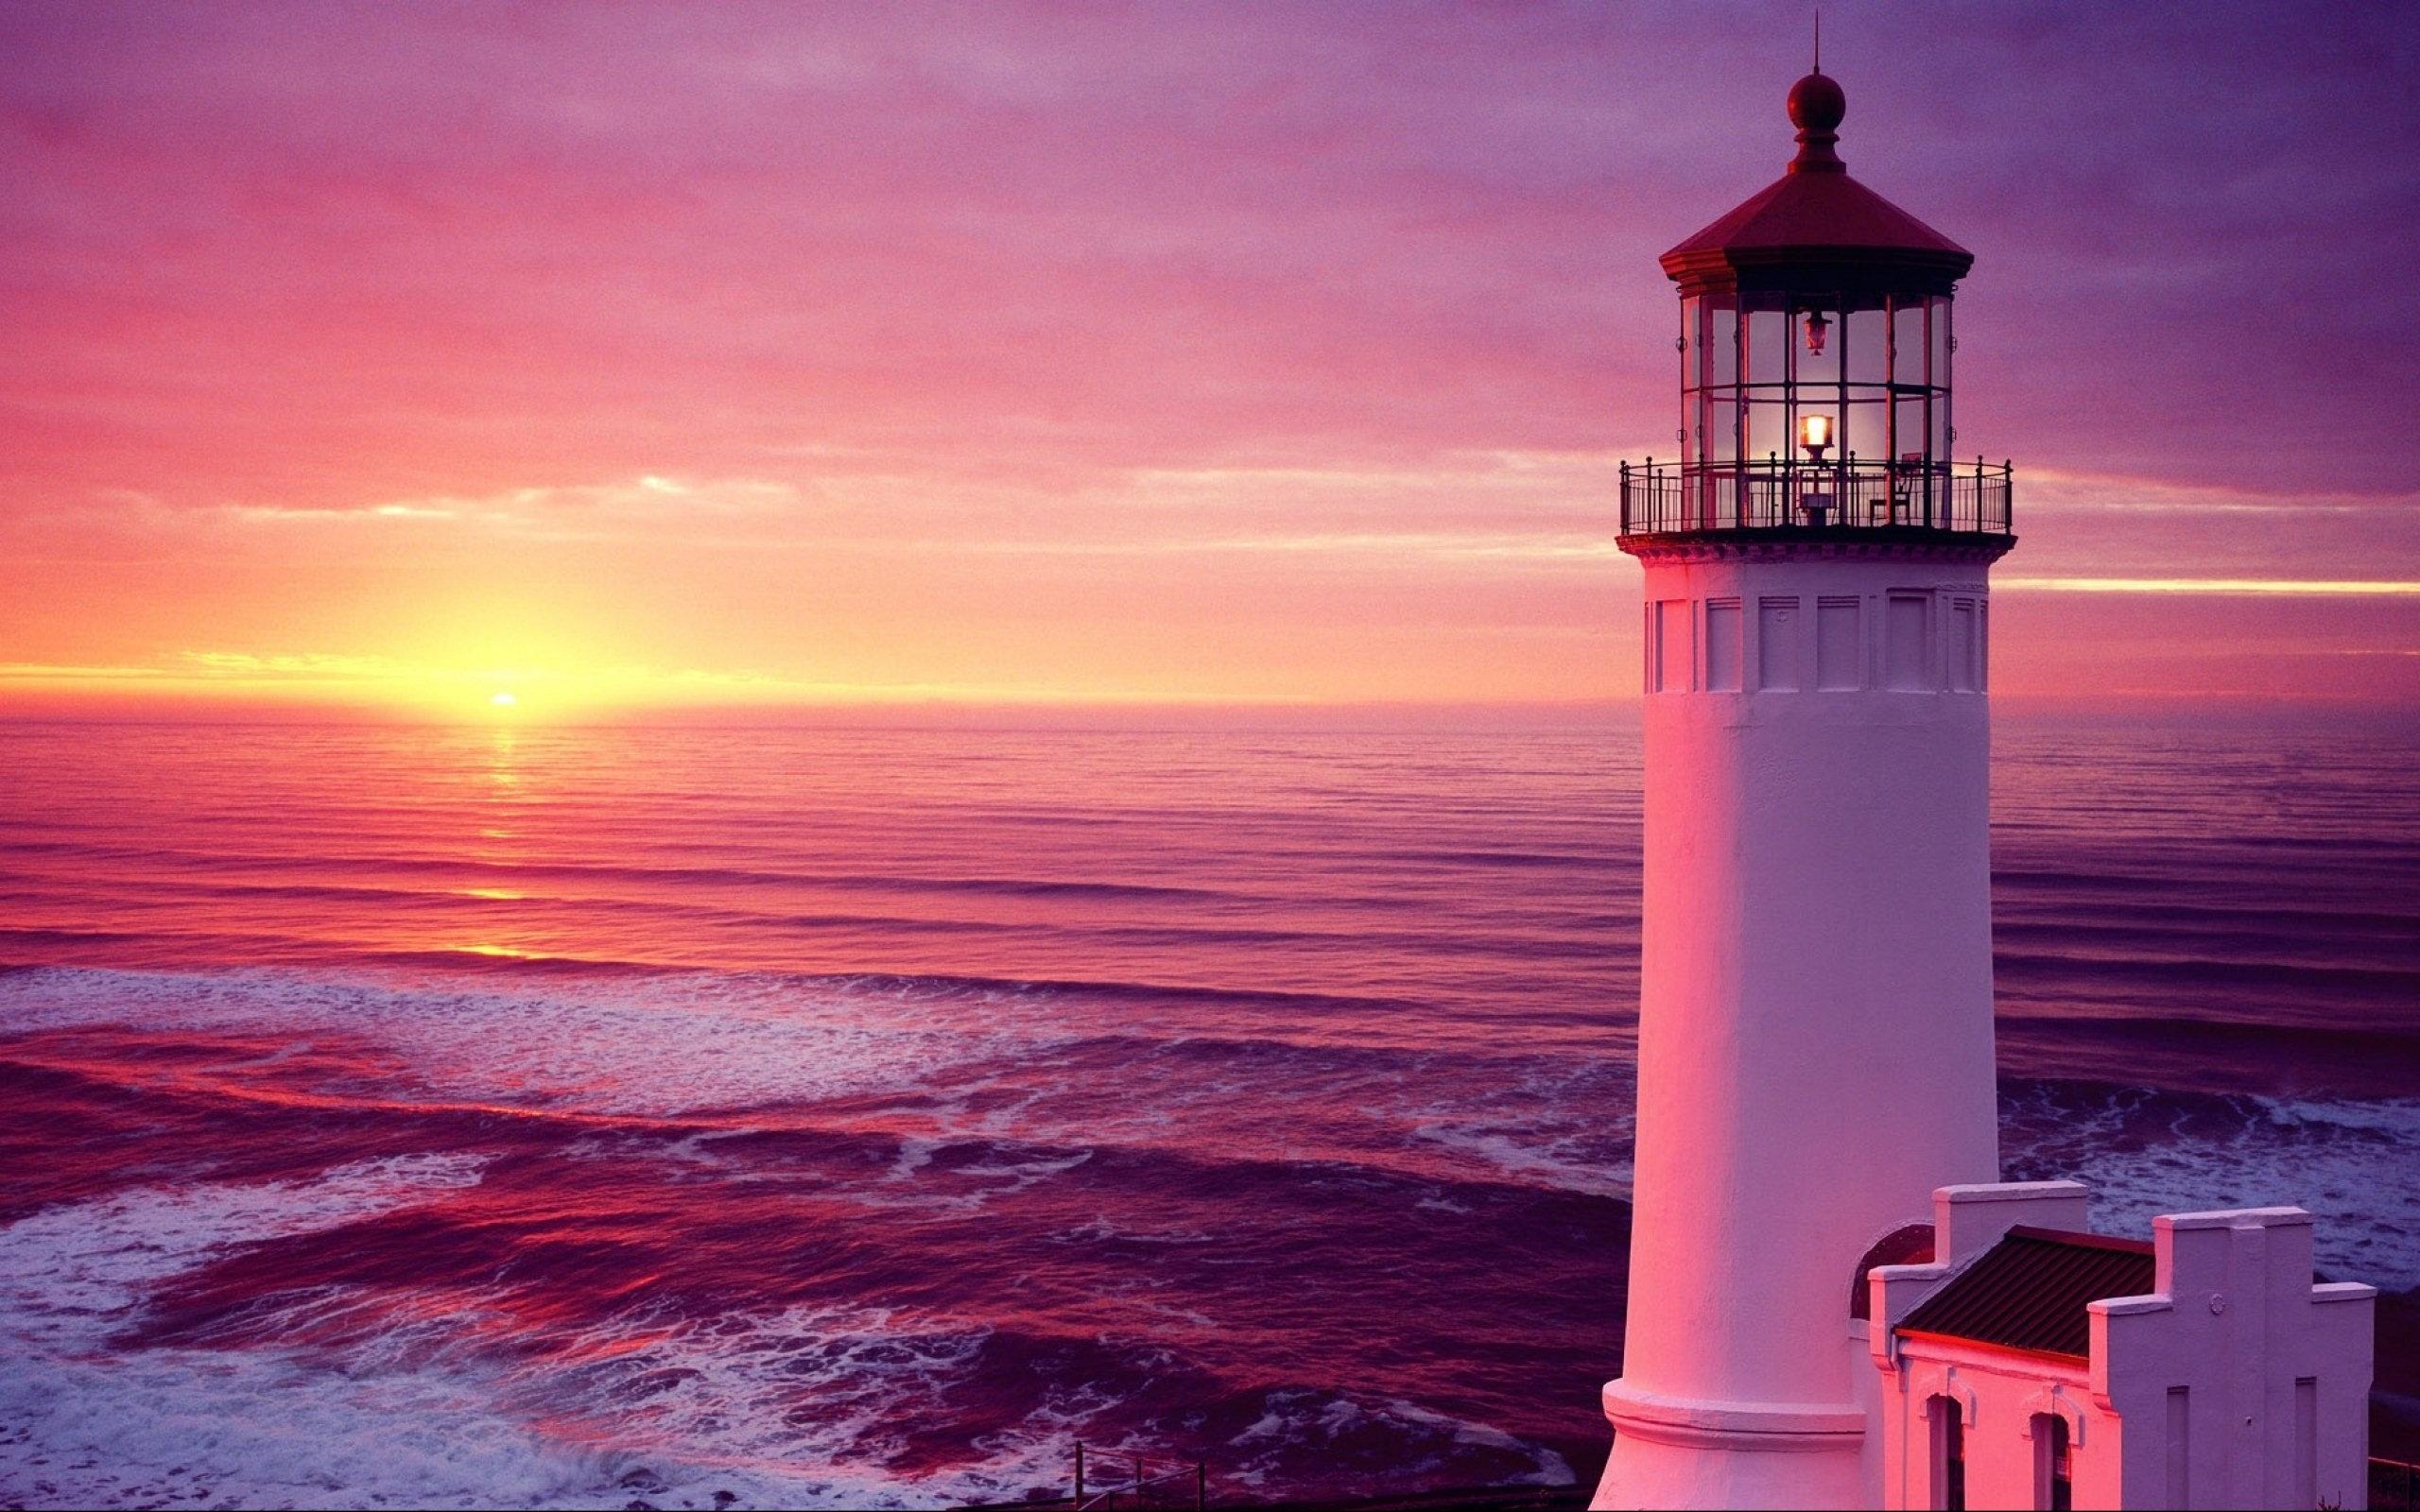 Lighthouse sunset